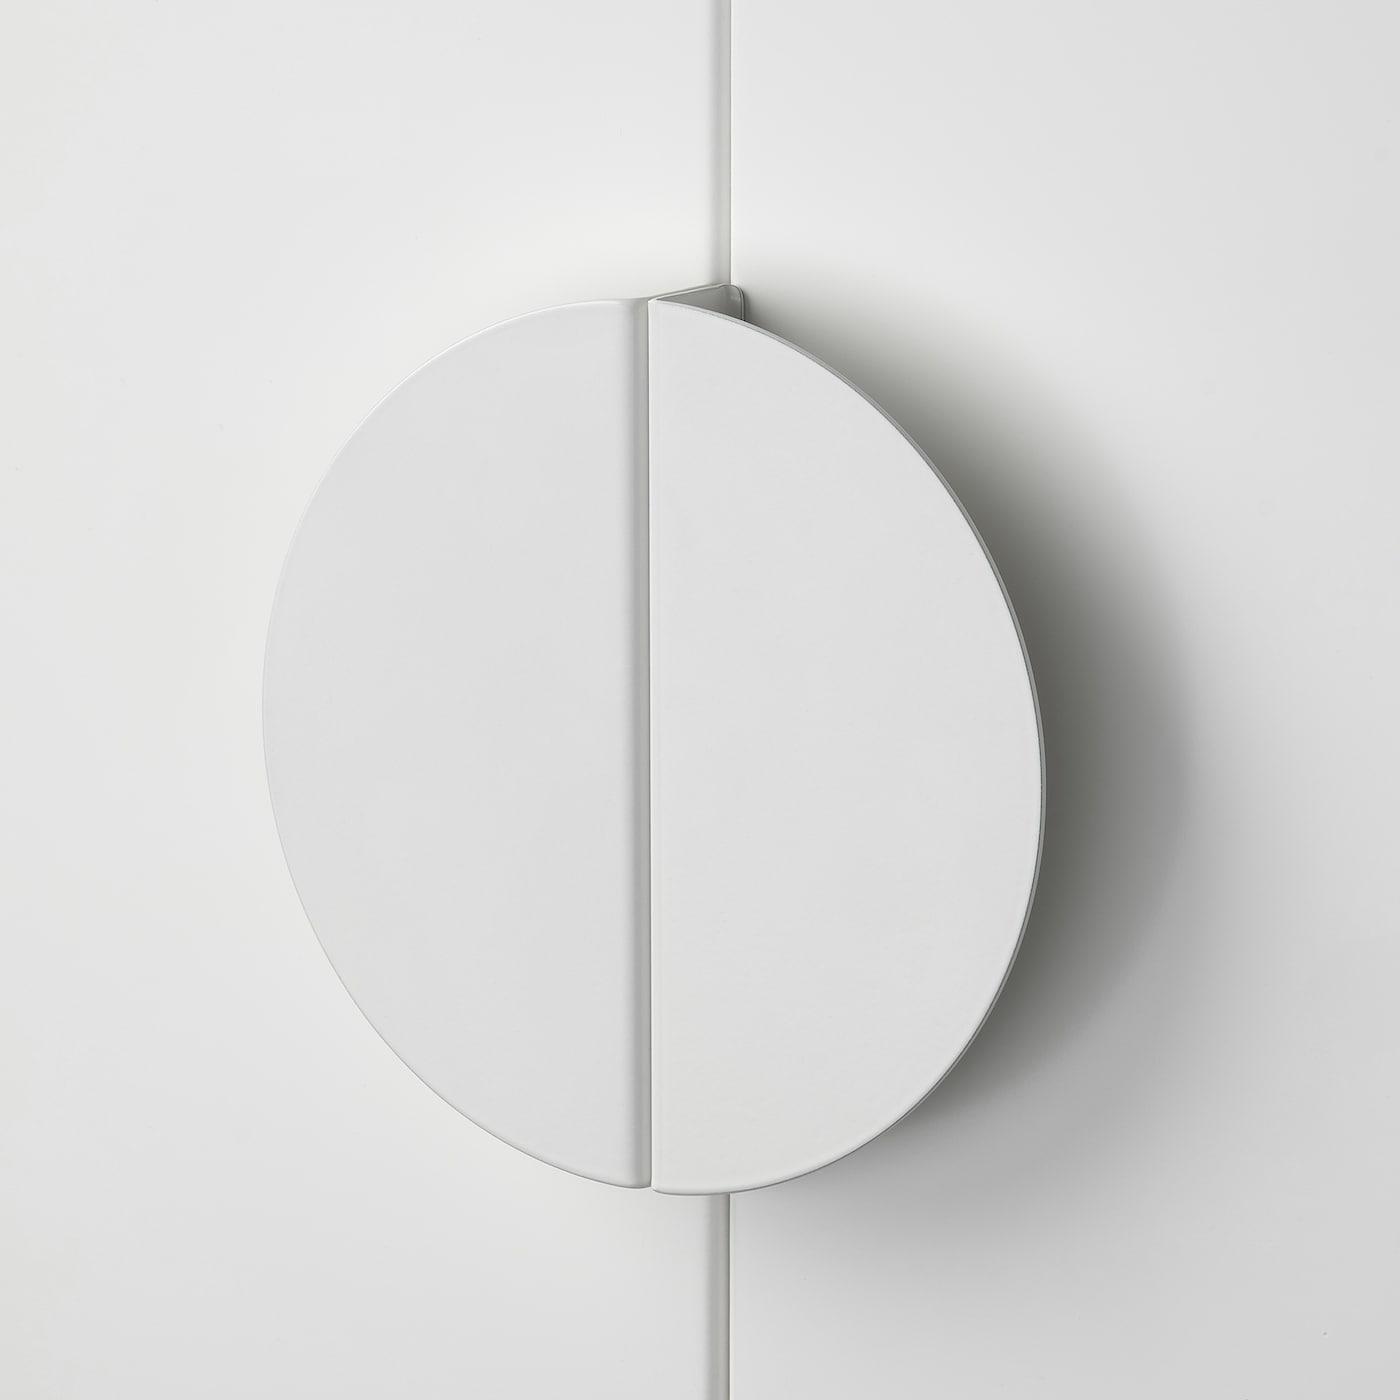 BEGRIPA ベグリパ 取っ手, ホワイト/半円形, 130 mm